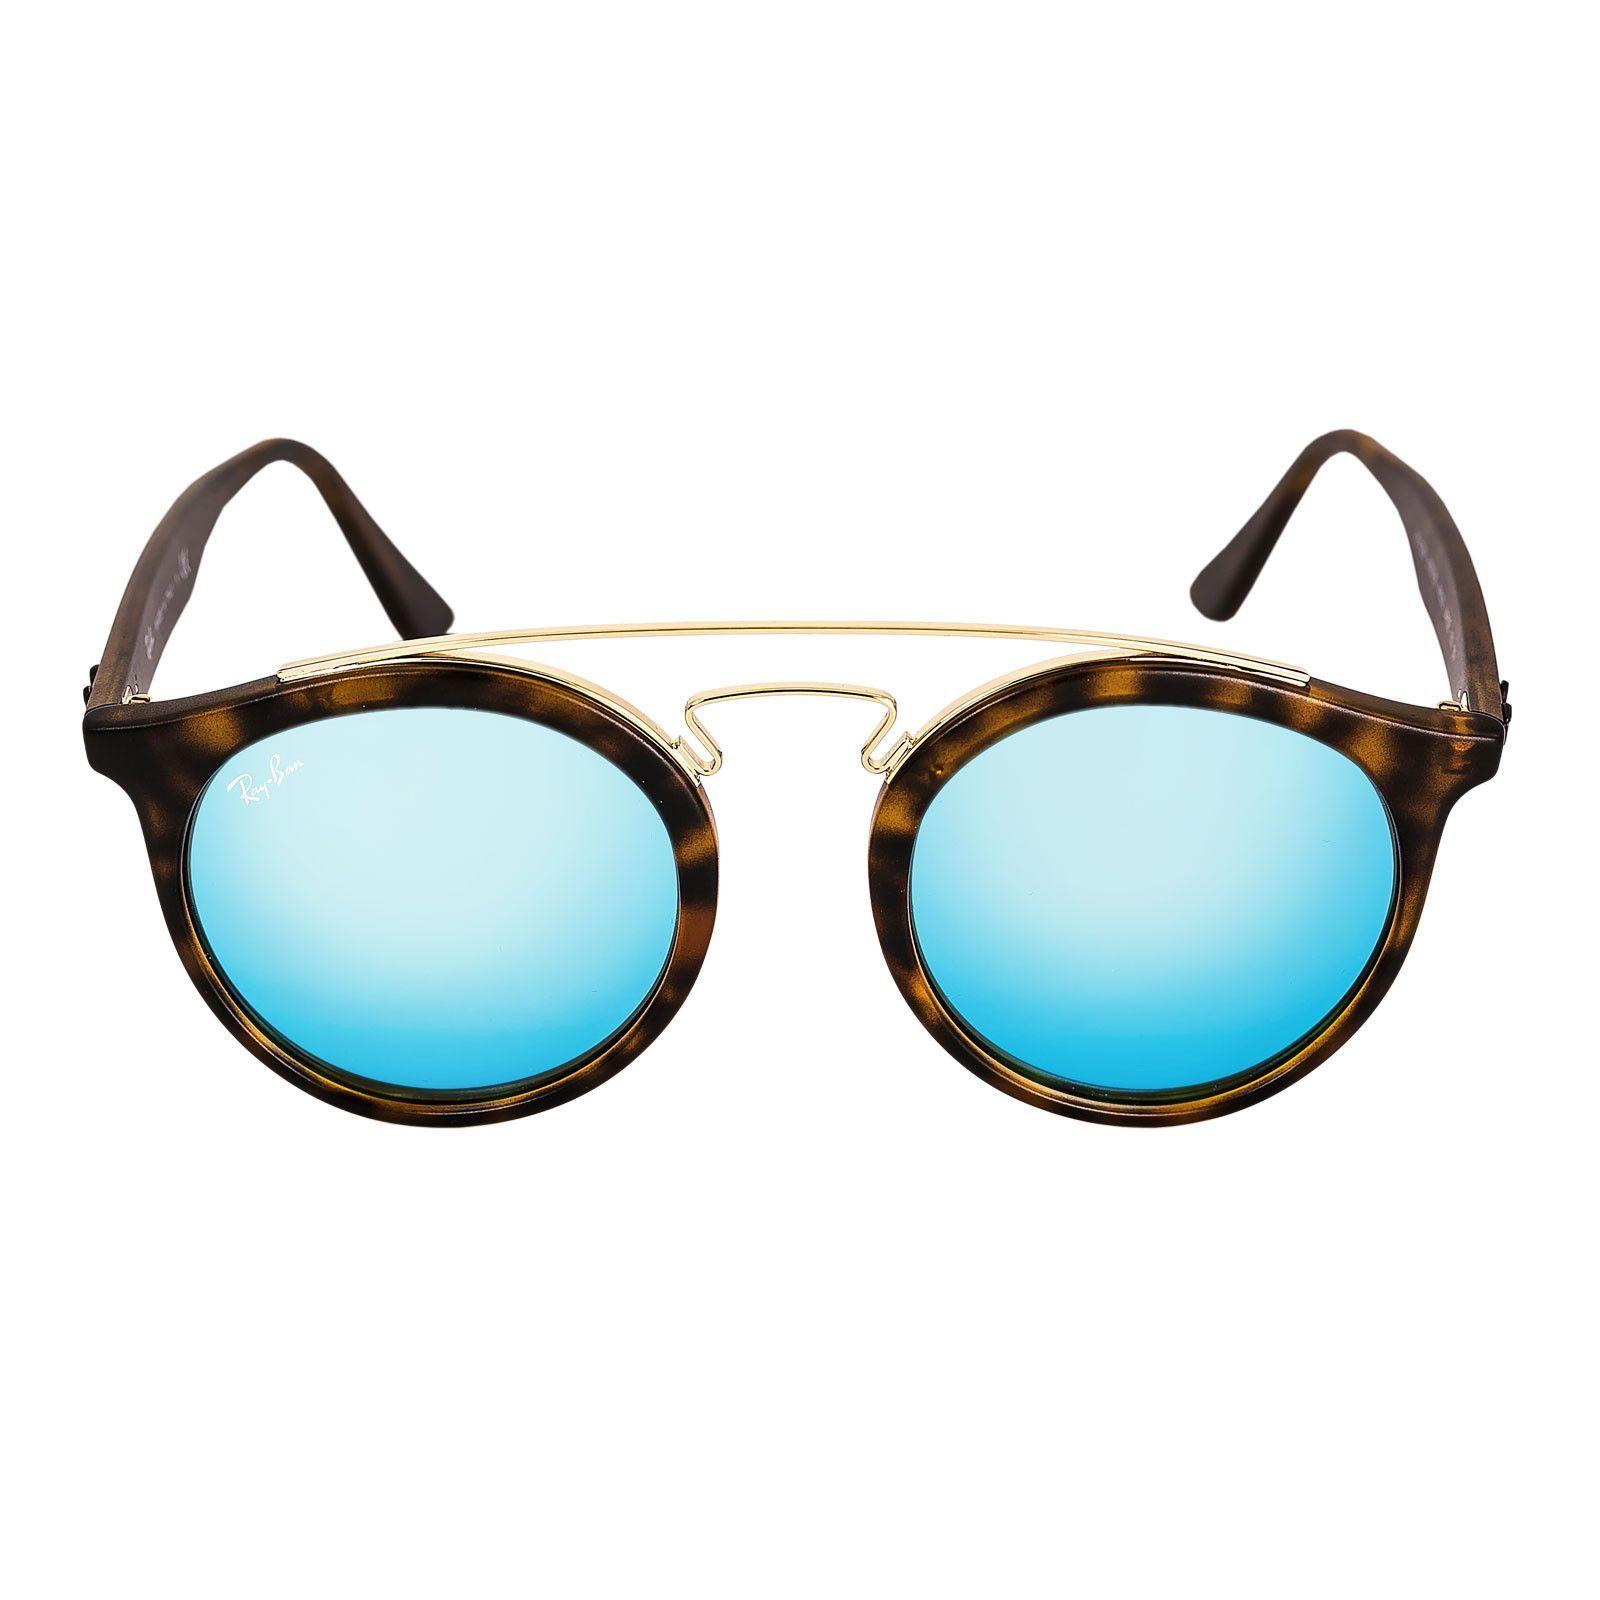 2a37d9bee1 Ray-Ban RB 4256 609255 49 Women s Gatsby I Blue Mirror Lenses Tortoise  Propionate   Gold Metal Frame Sunglasses